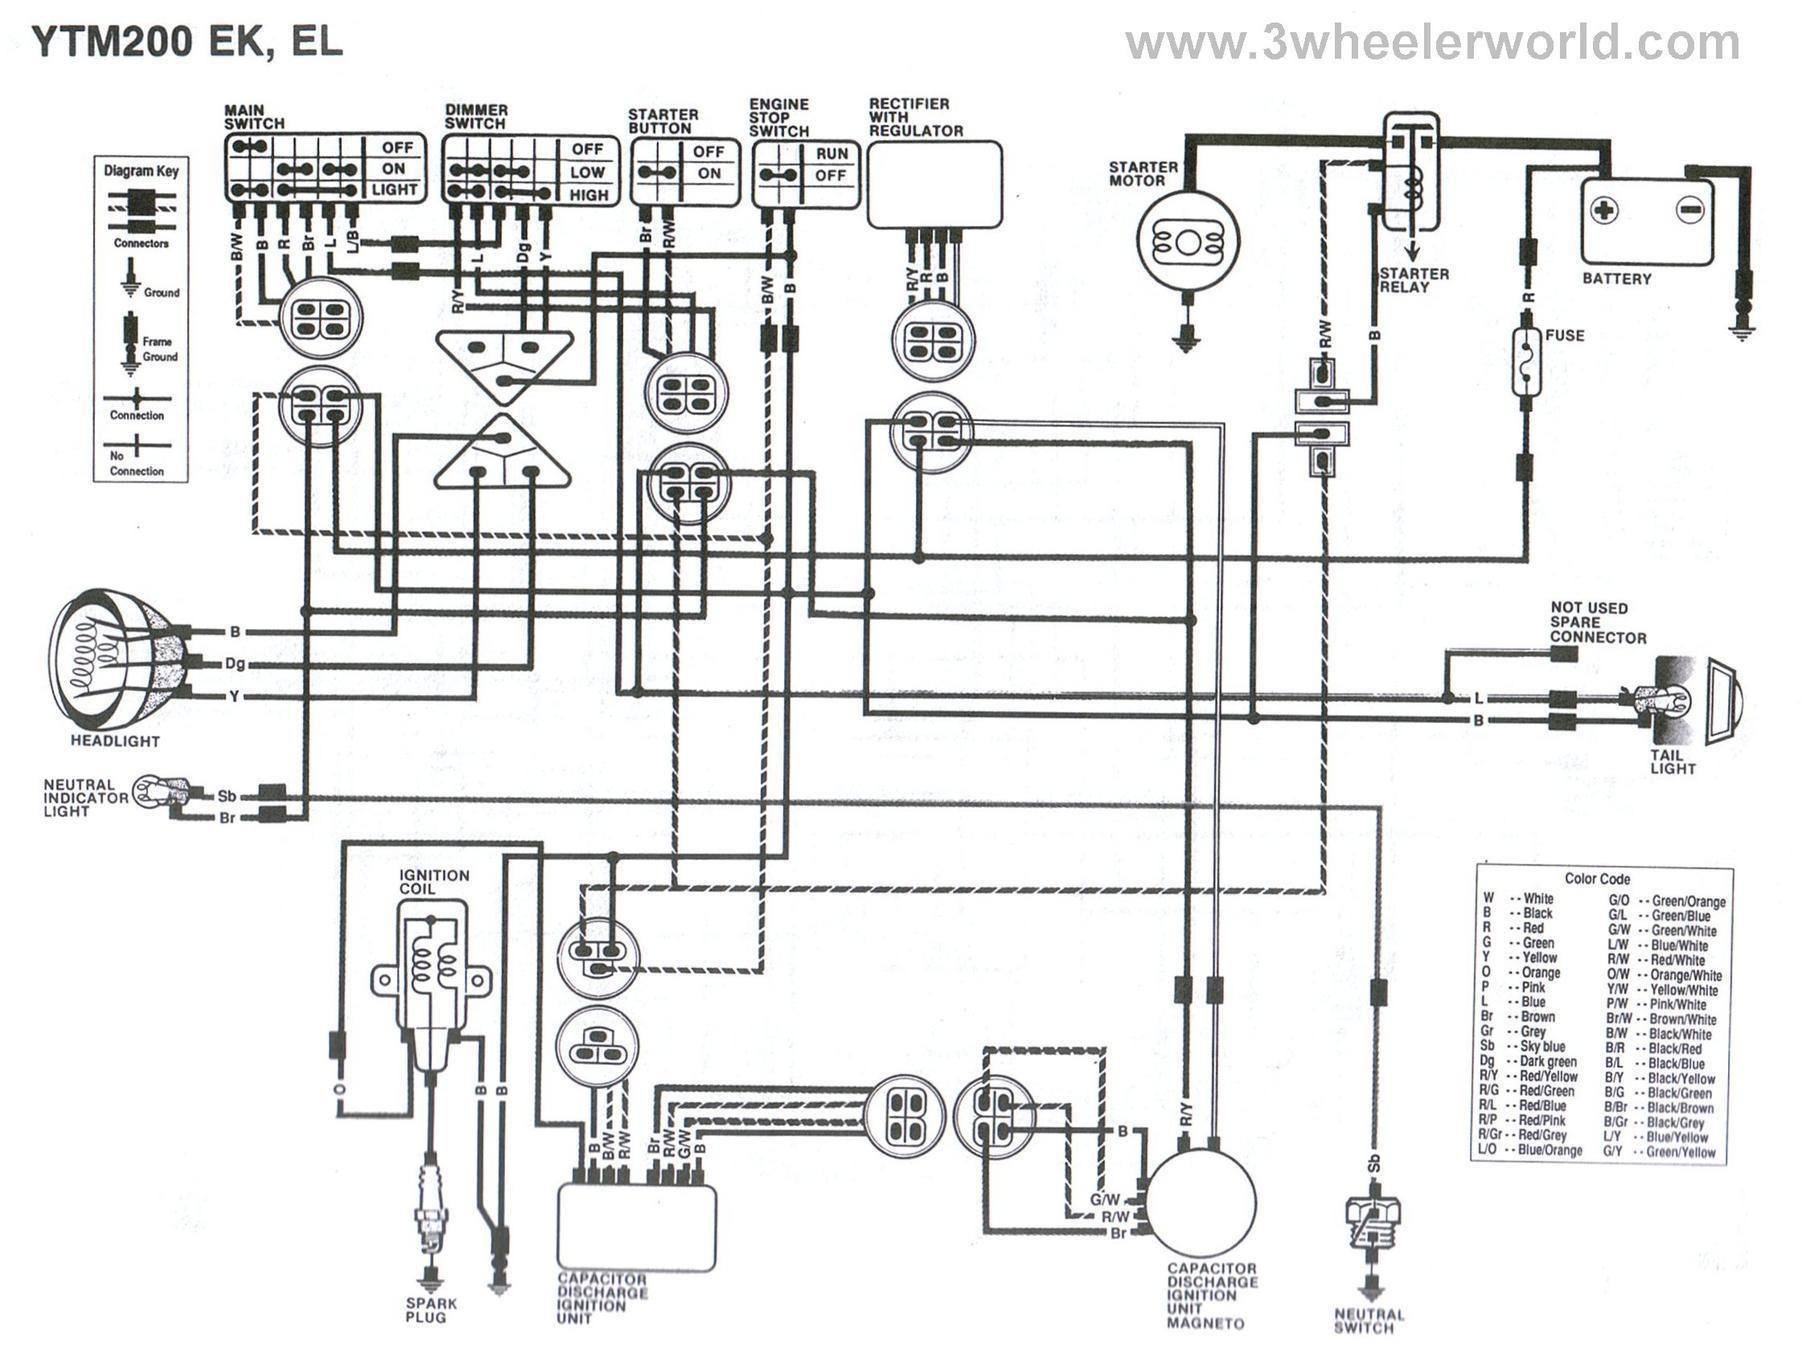 3WHeeLeR WoRLD     Yamaha    YTM200 EK EL   Yamahauler     Wiring